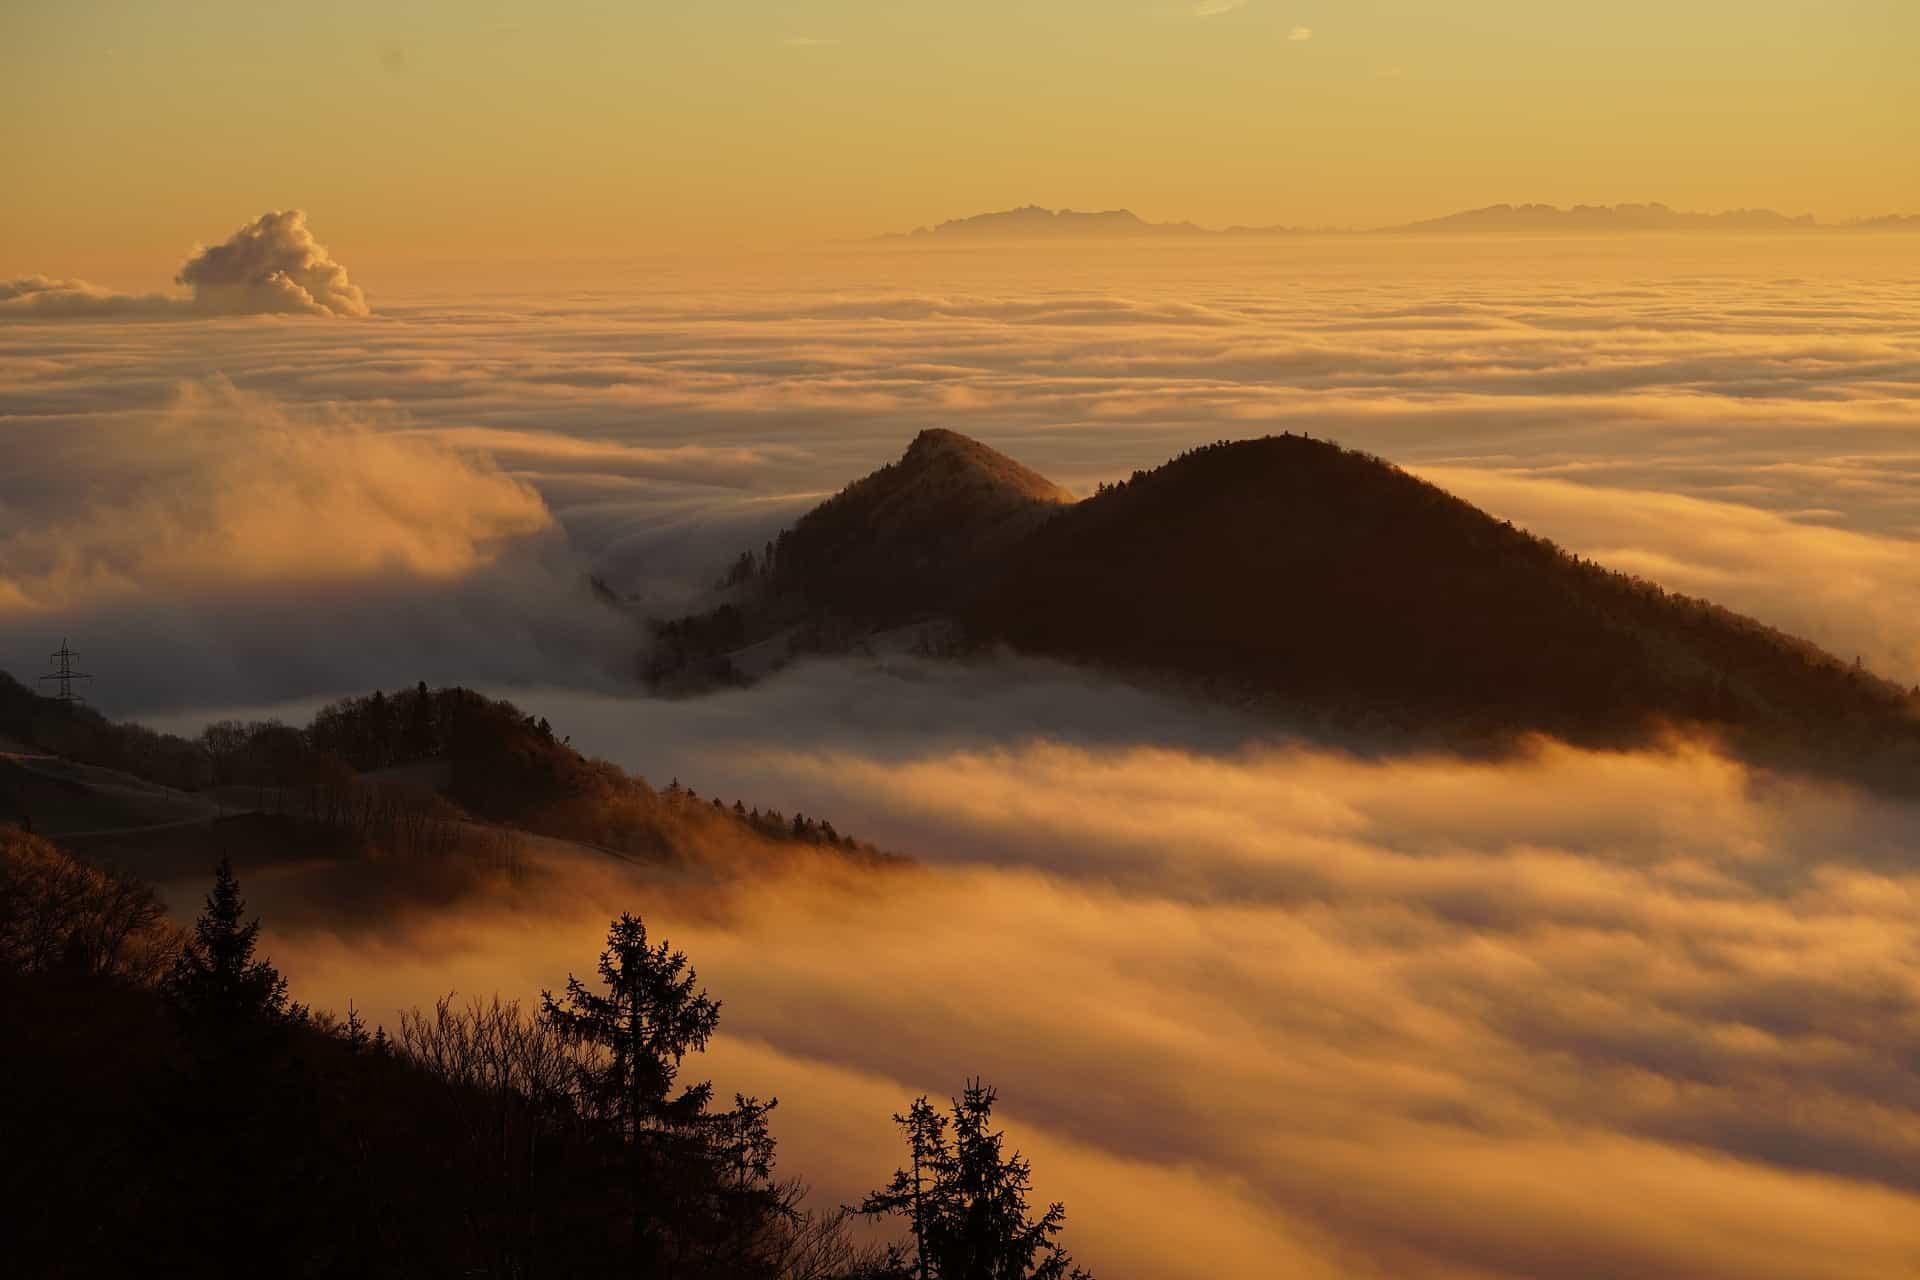 Alp Selva Homberg Hikes in Austria